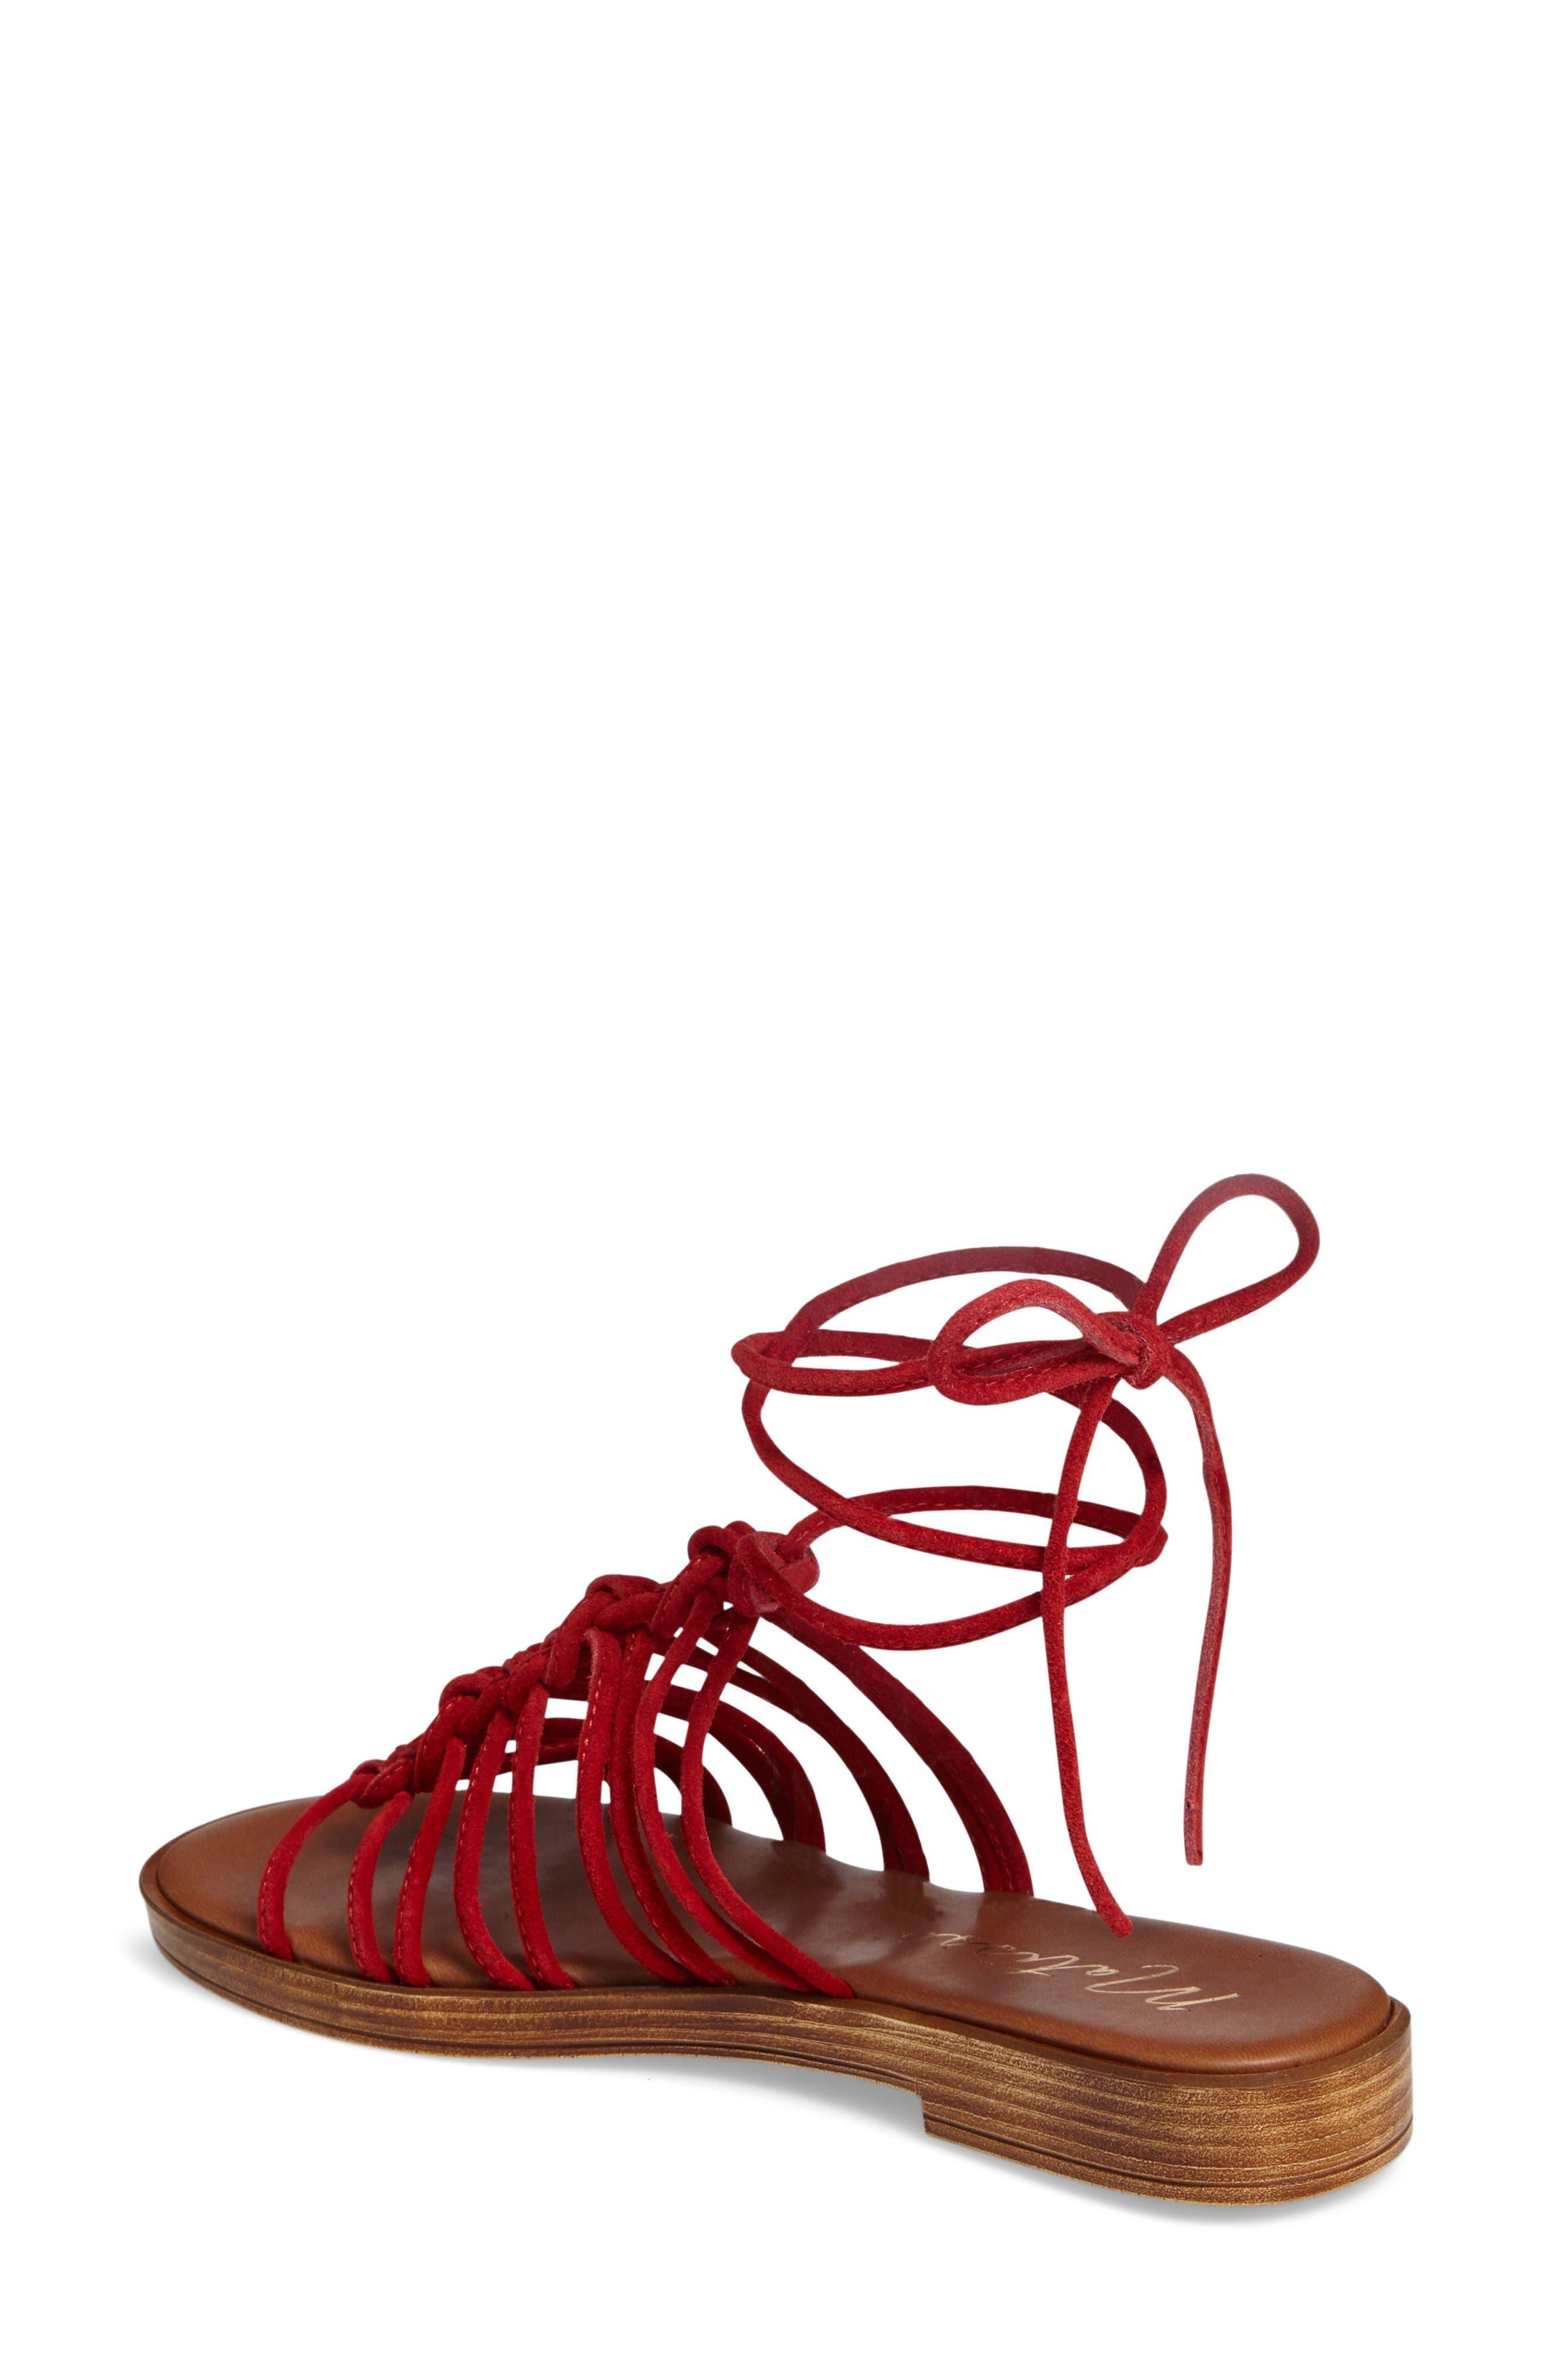 Origin Lace-Up Sandal,                             Alternate thumbnail 2, color,                             Red Suede